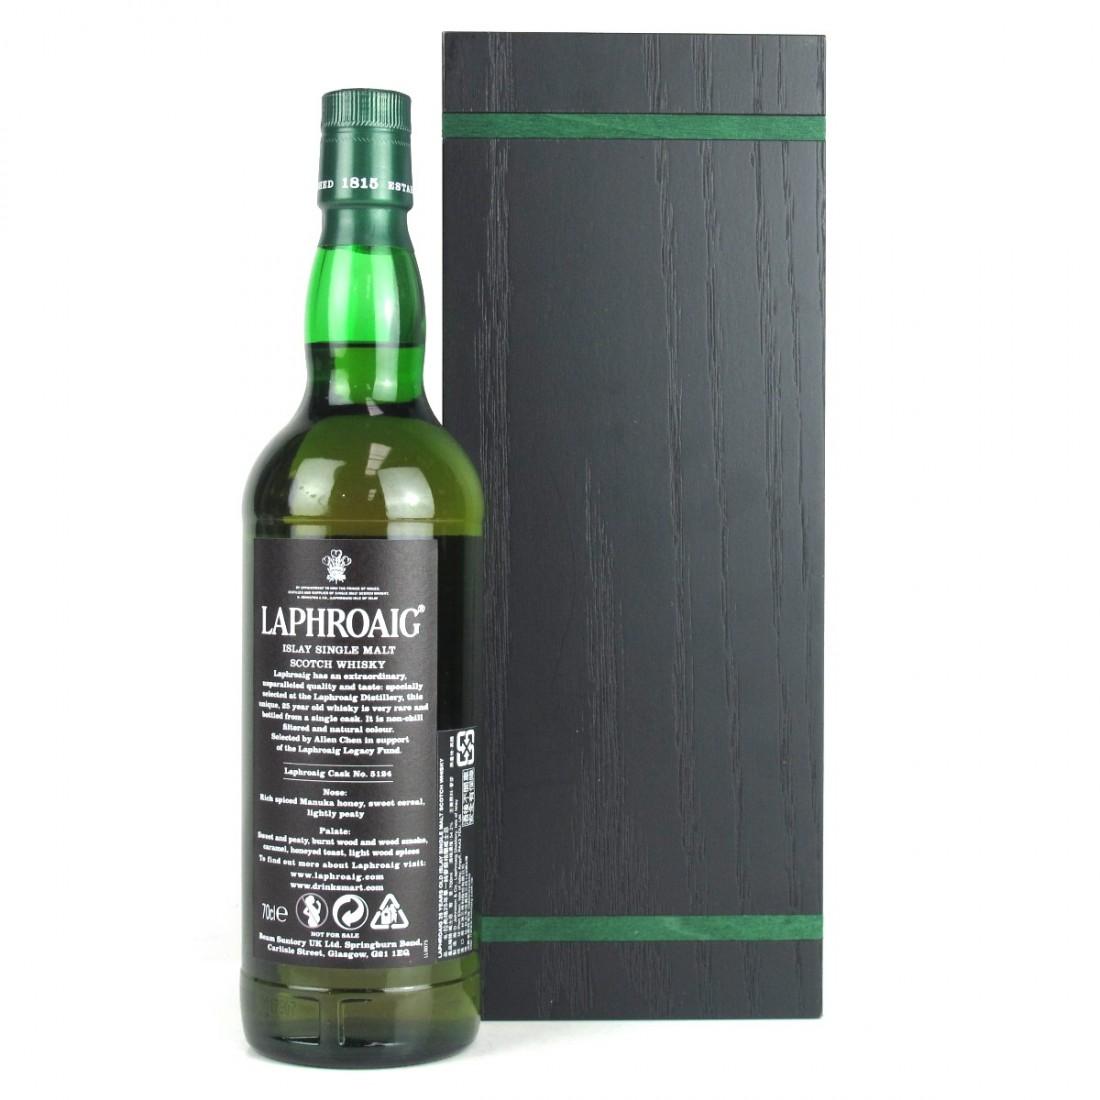 Laphroaig 25 Year Old Single Cask / Aqua Vitae Whisky Selection